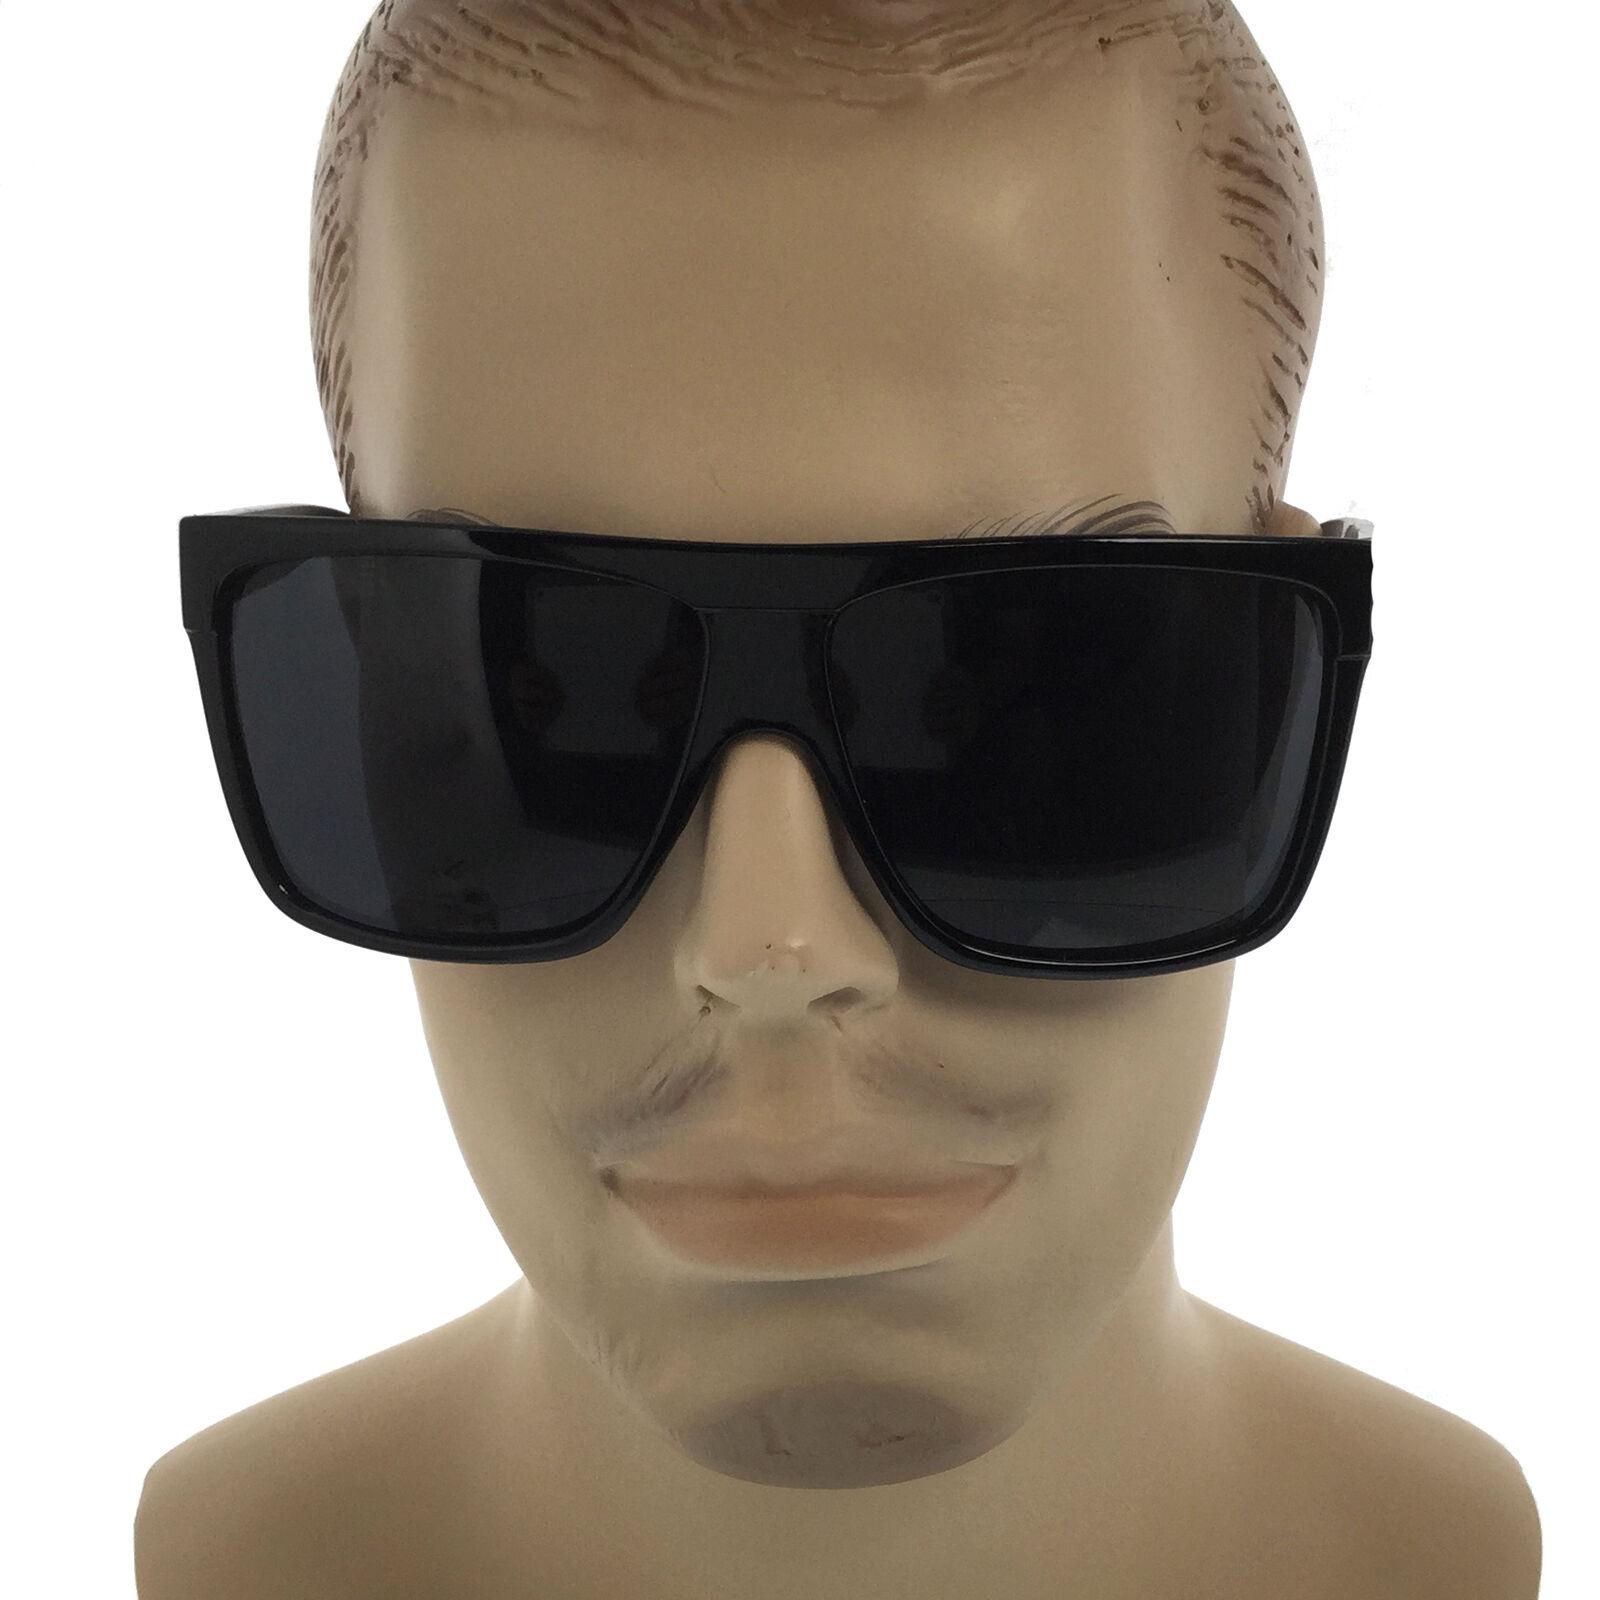 e716cad1f41 Best Oakley Sunglasses For Big Head Football - Restaurant and ...